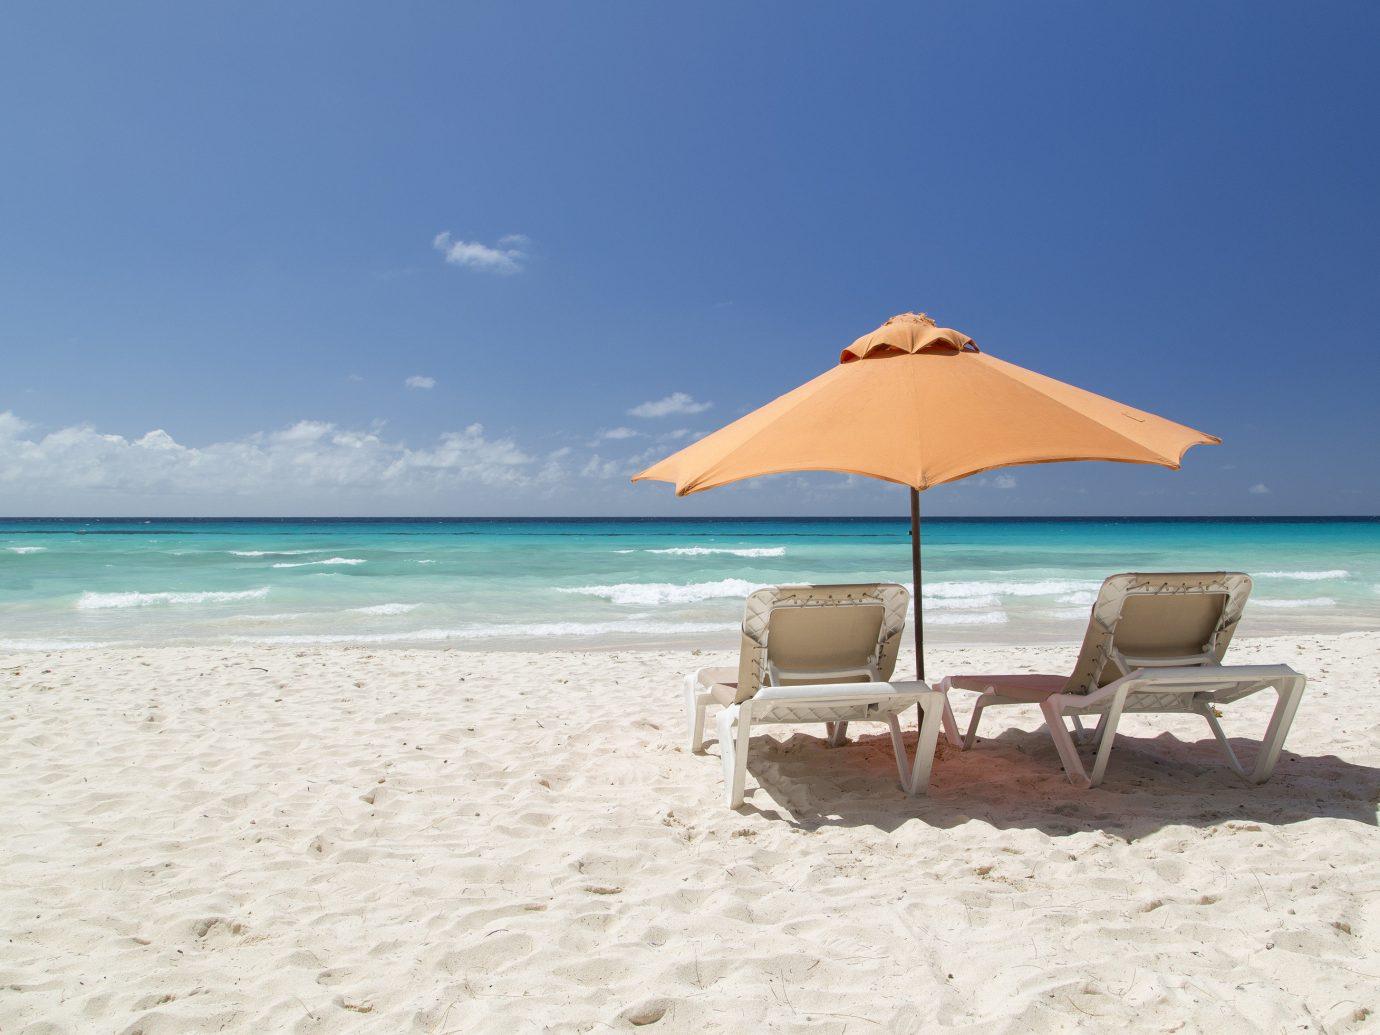 Hotels sky outdoor Beach umbrella water chair shore Nature body of water Sea leisure Ocean vacation caribbean sand Coast Lagoon sun tanning bay Island swimming pool Resort sandy